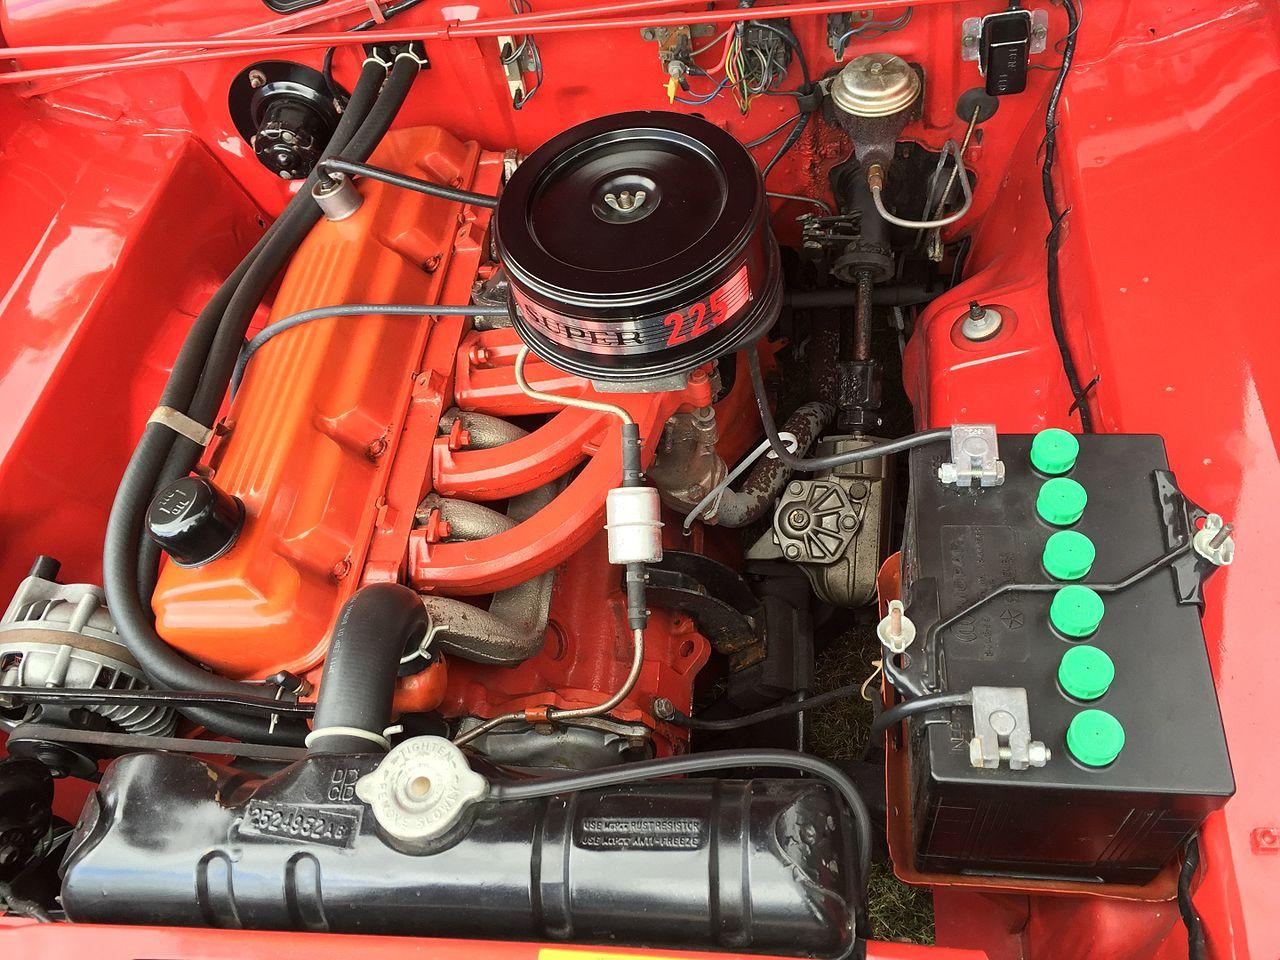 1985 k 5 chevy blazer wiring diagram restored entry level car 1964 dodge dart 170  restored entry level car 1964 dodge dart 170